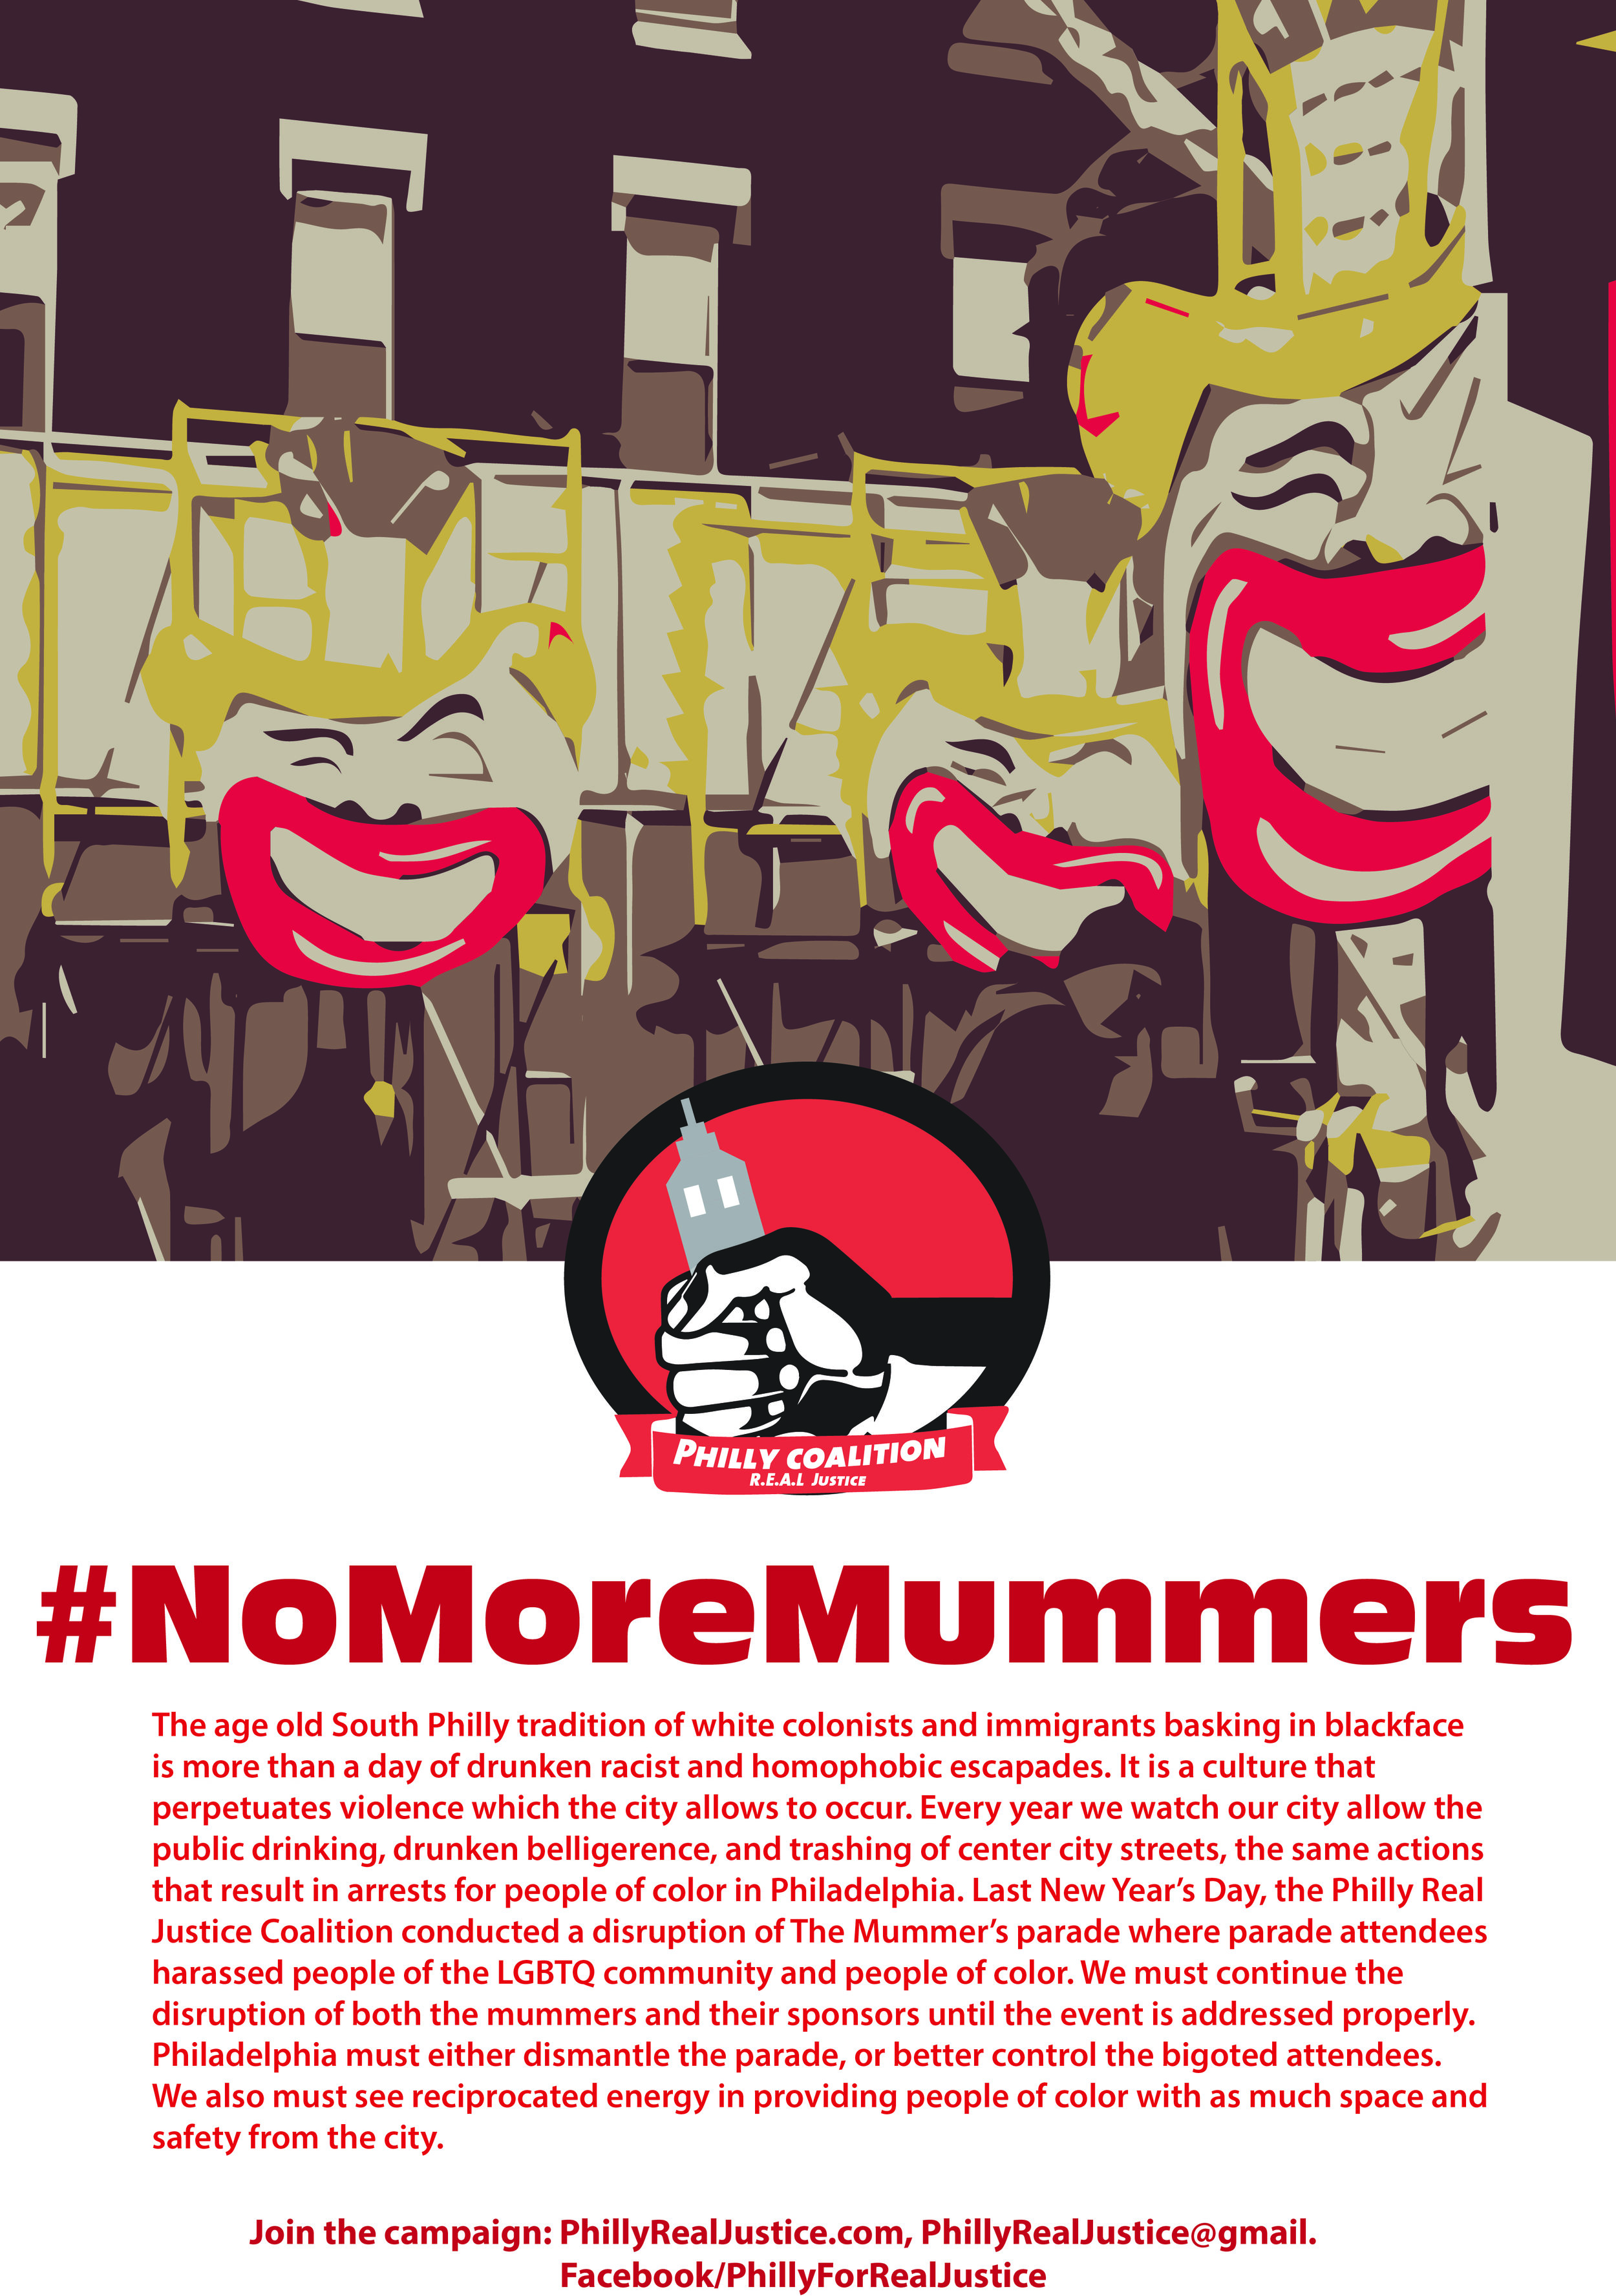 NoMoreMummers